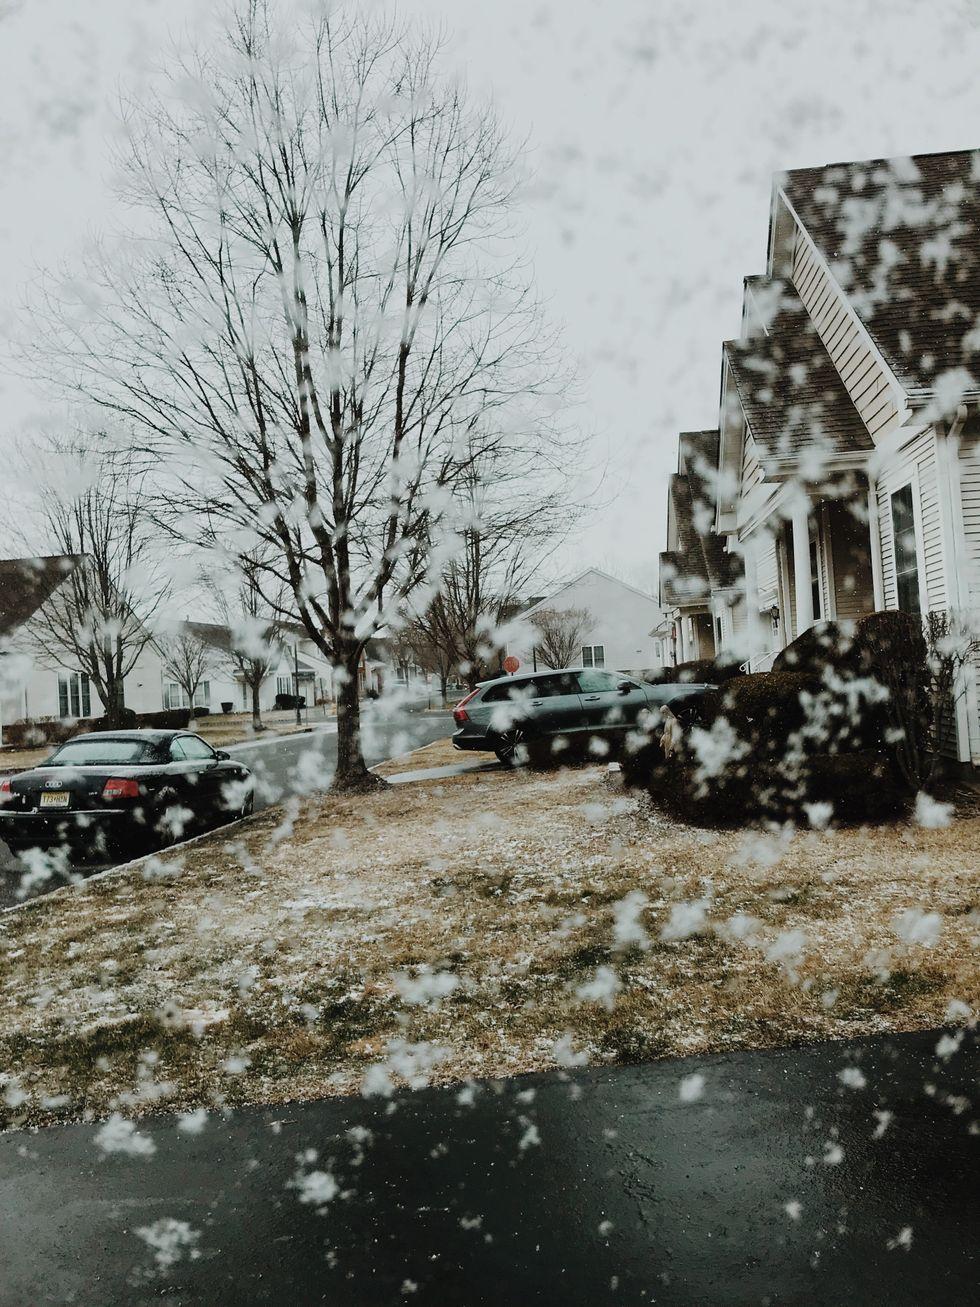 To The Longest Winter Break Ever